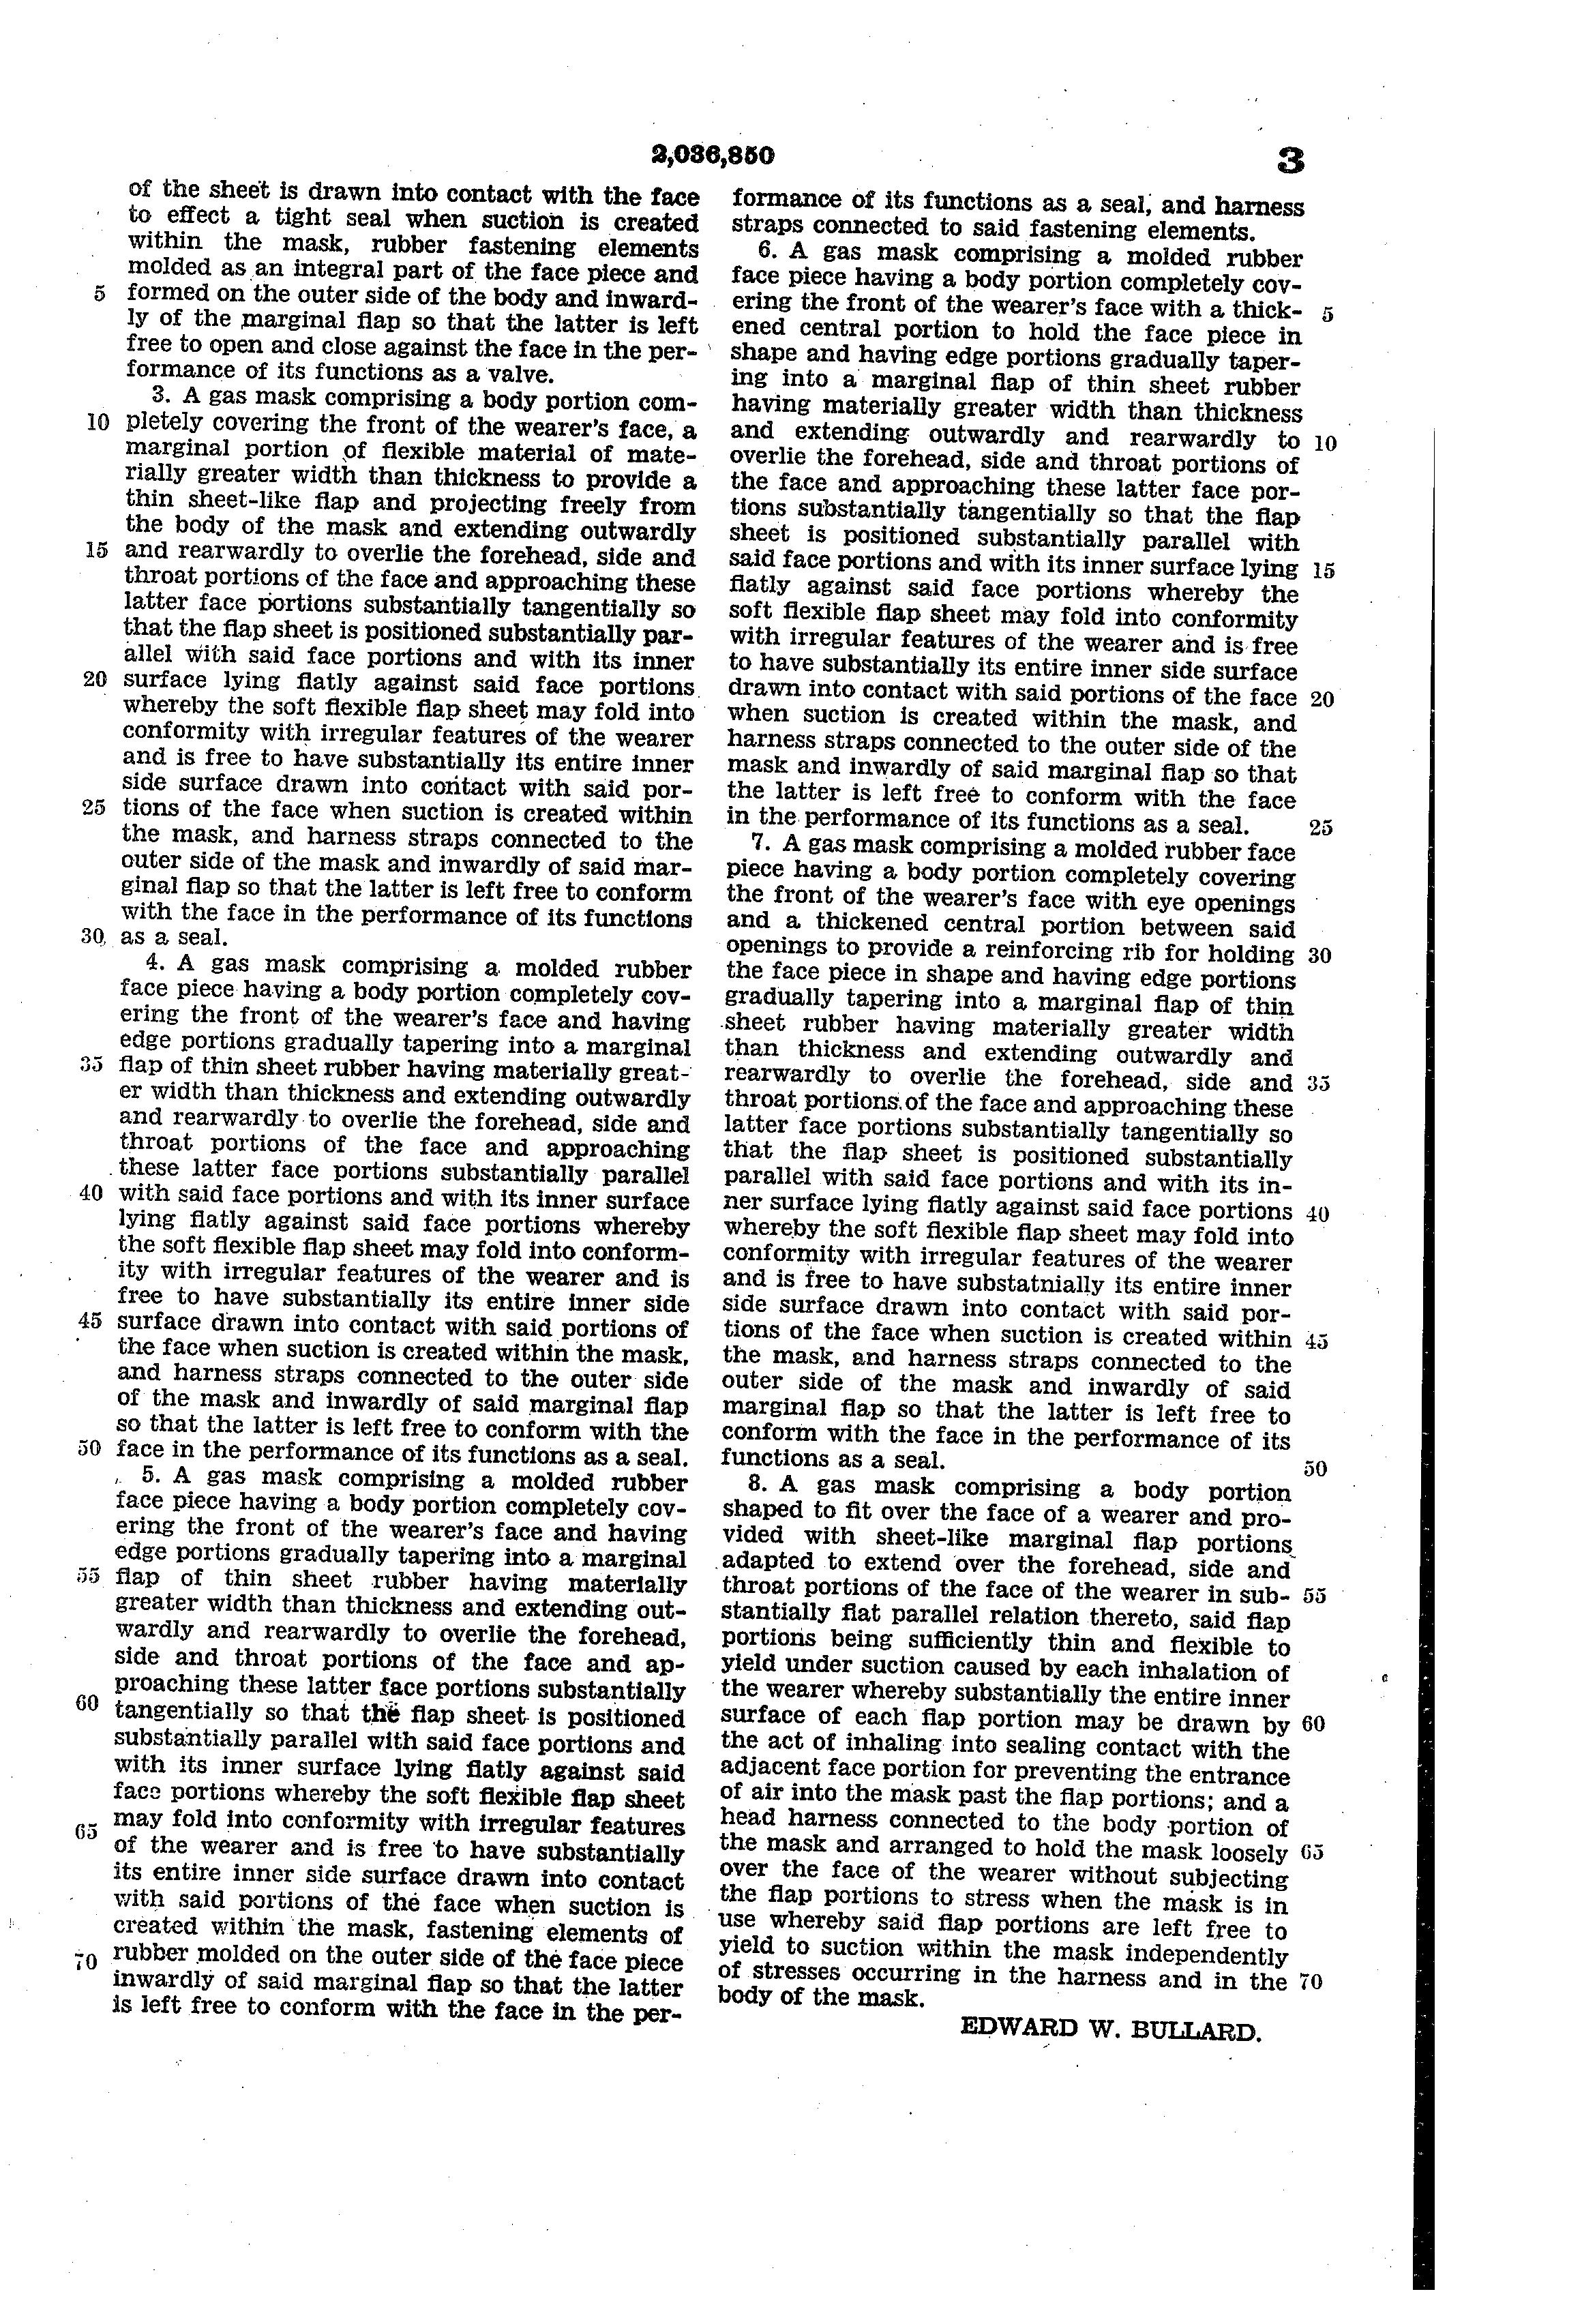 April 7, 1932 Patent